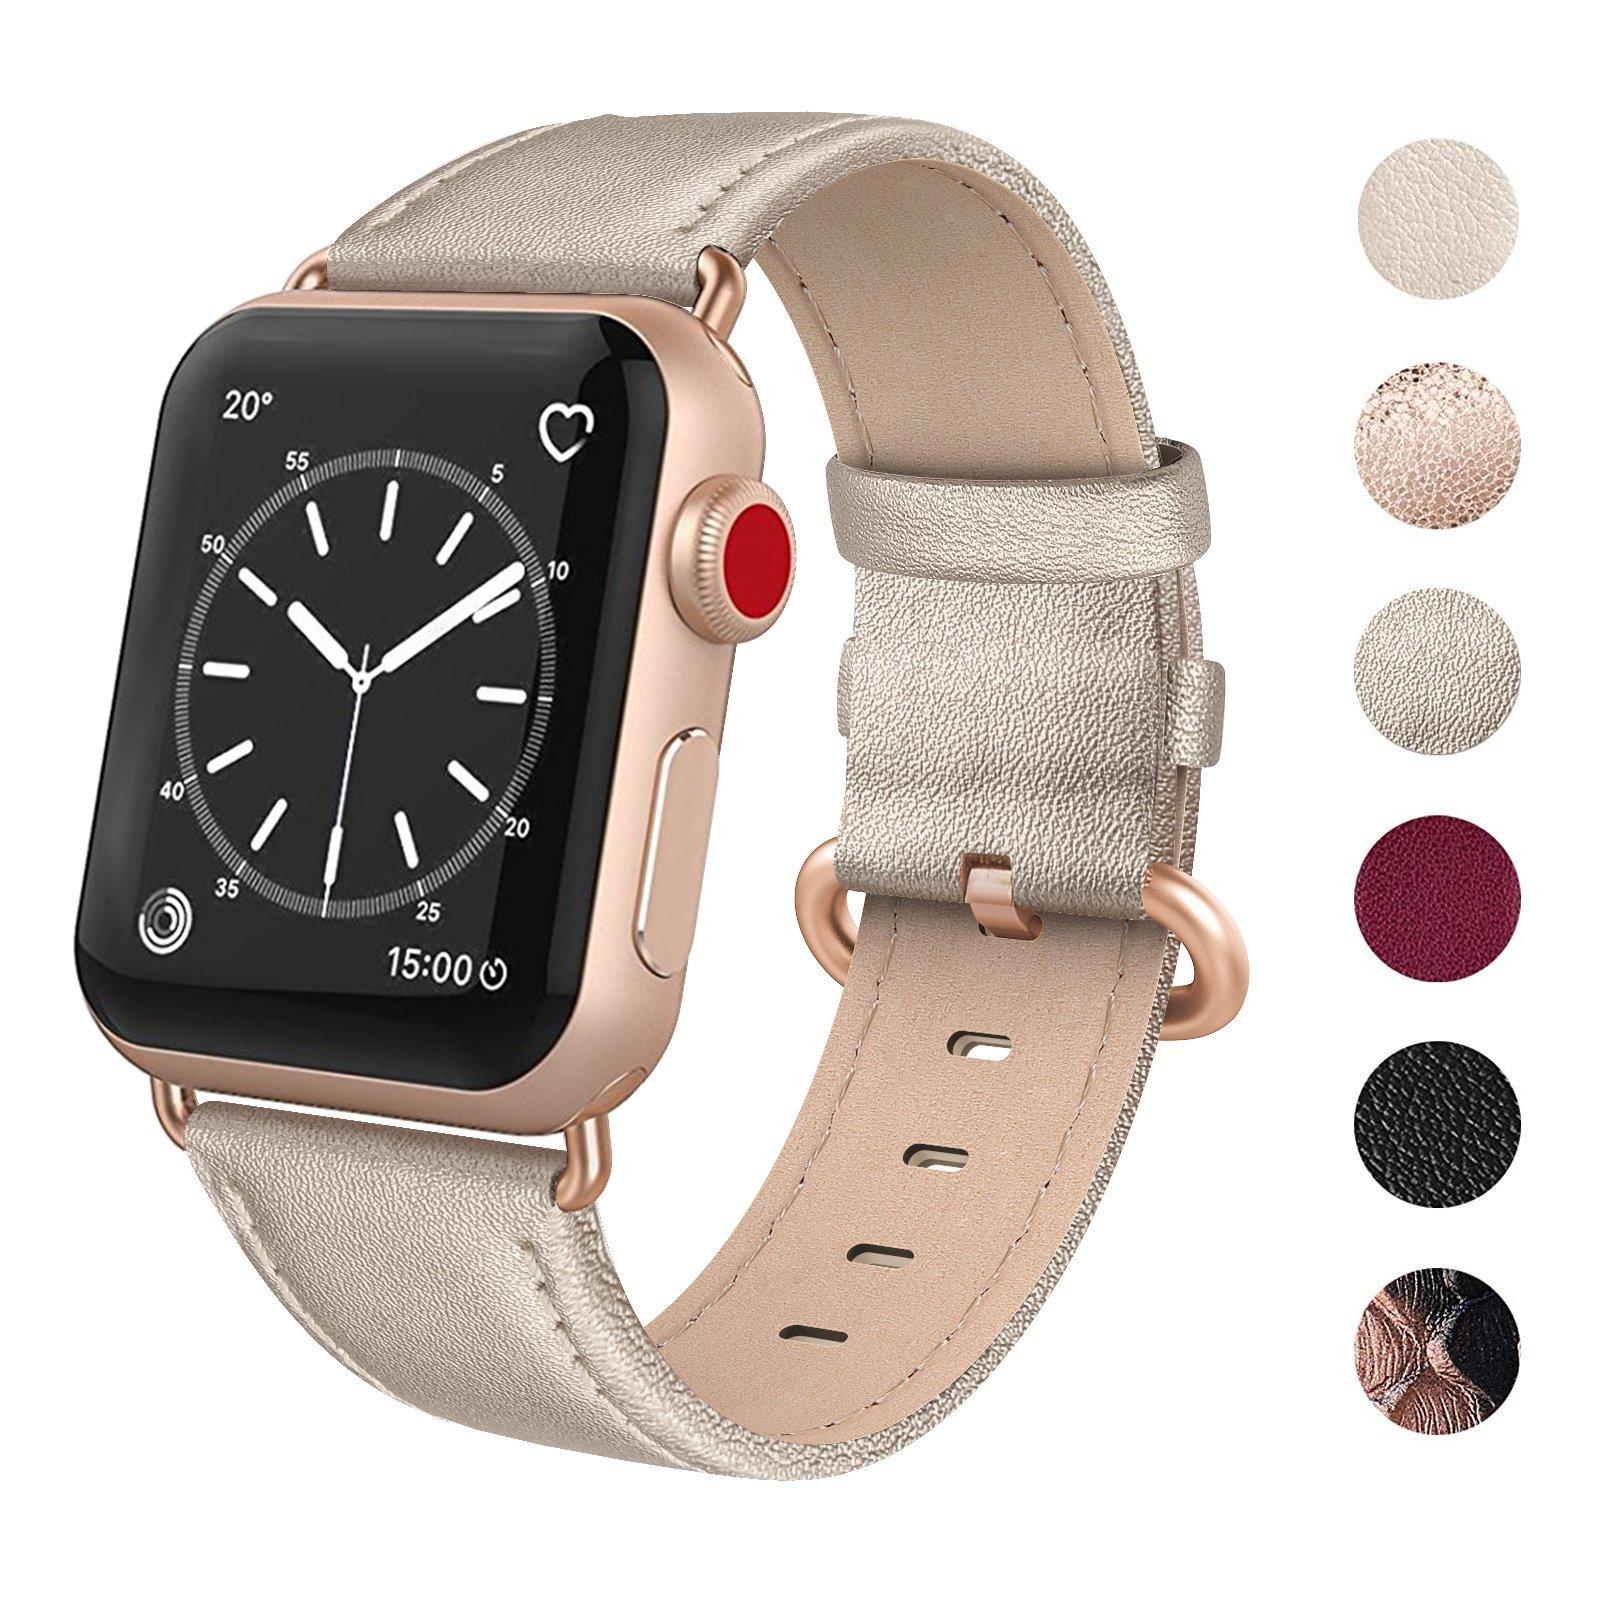 Malla Cuero para Apple Watch (38/40mm) SWEES [7FKCGQB5]